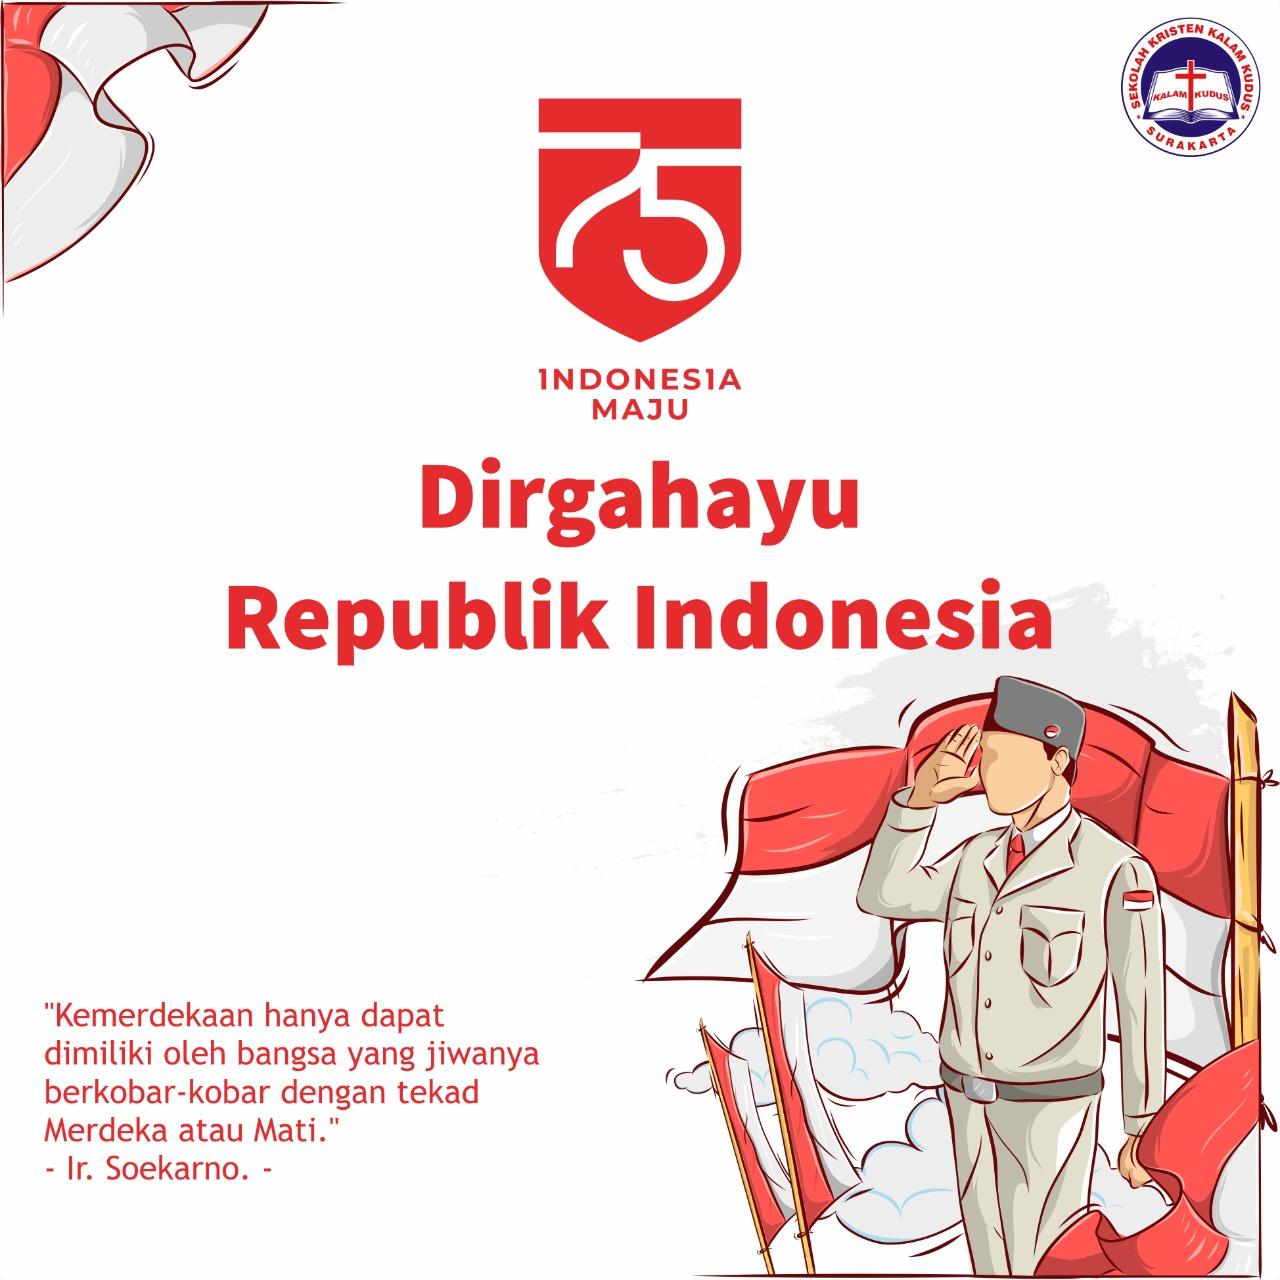 Dirgahayu Republik Indonesia 17 Agustus 2020